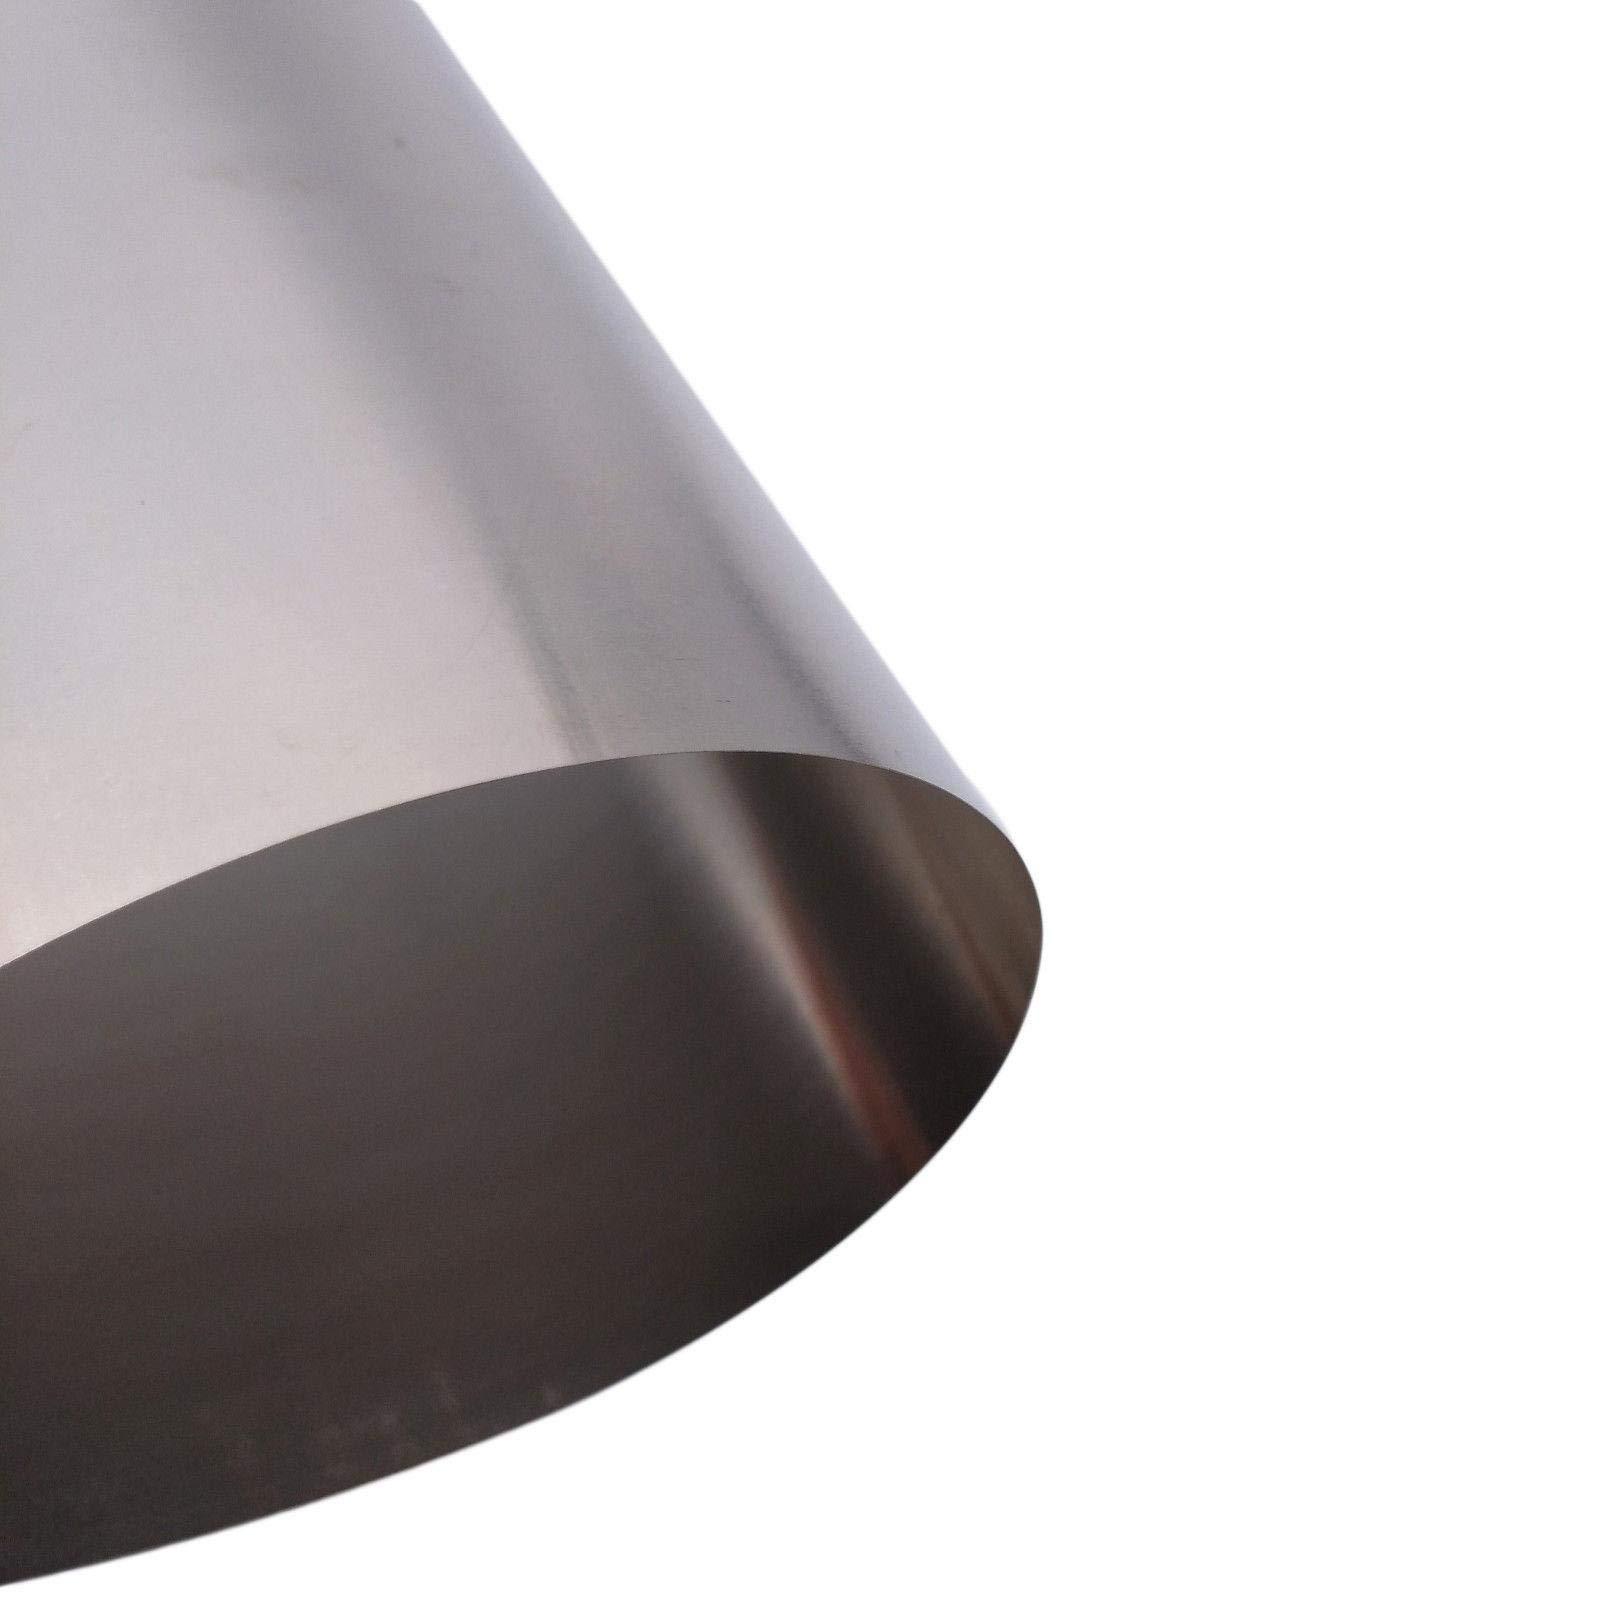 0.1mm x 200mm x 300mm Titanium Foil Plate Sheet TA2 99% Purity by Yodaoke